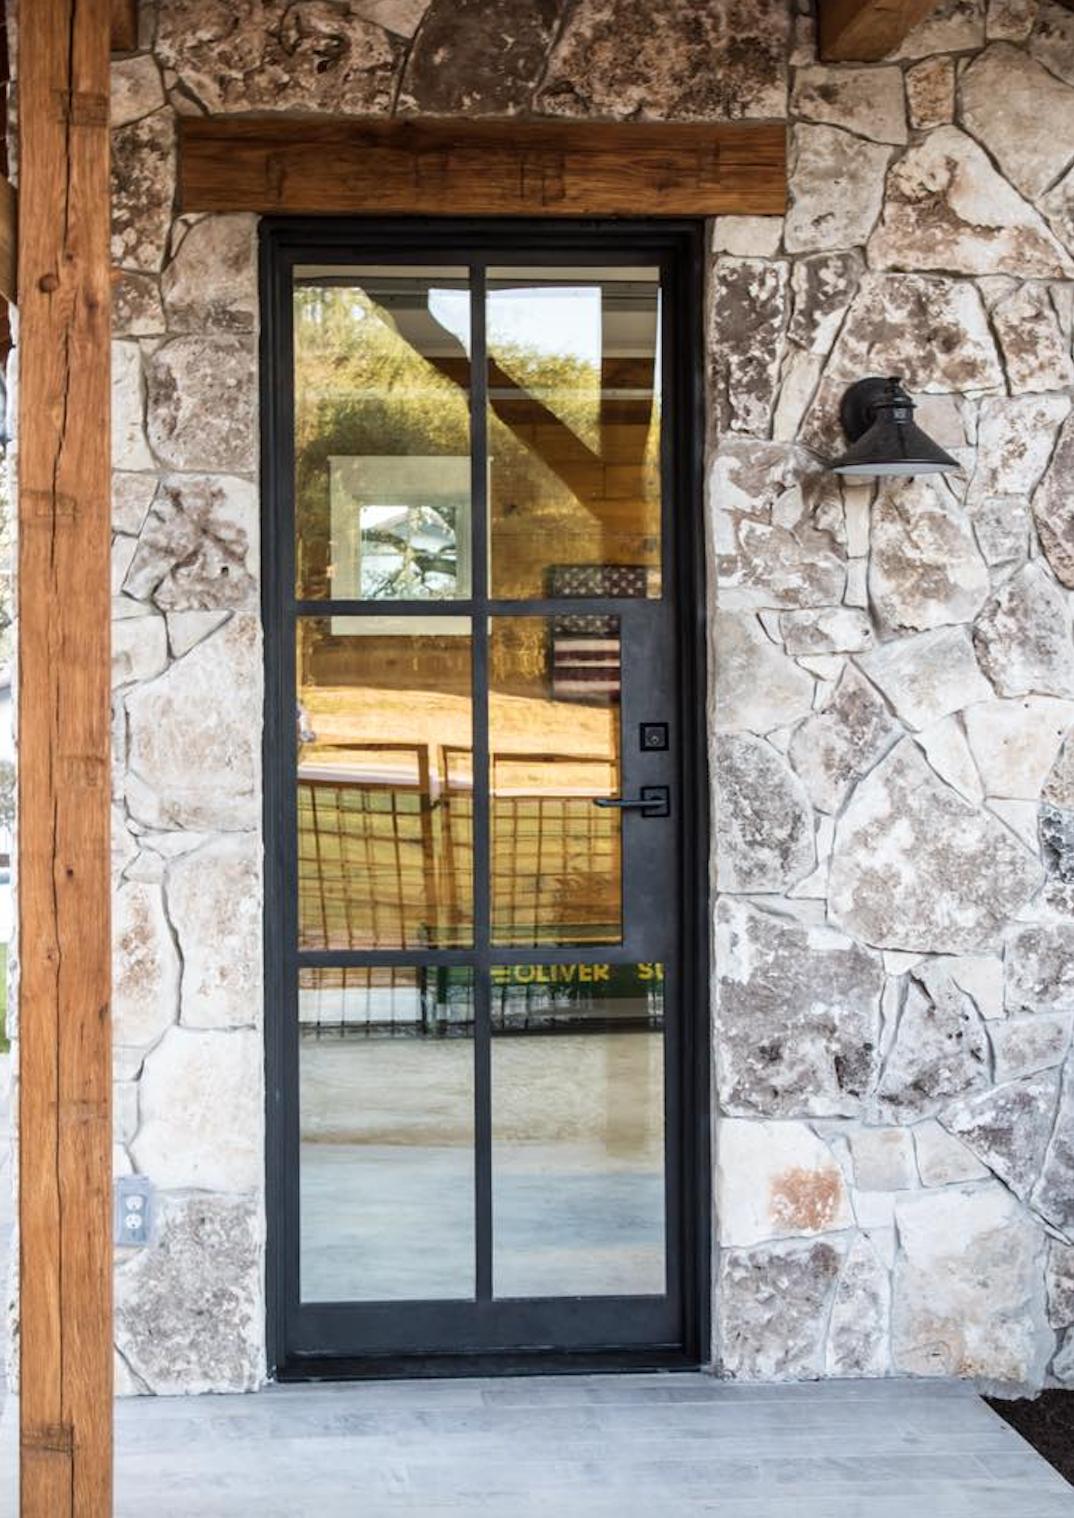 Luxury Steel Door Backdoor Patiodoor Canteradoors Steeldoor Puertas De Vidrio Molduras Para Ventanas Casas De Piedra